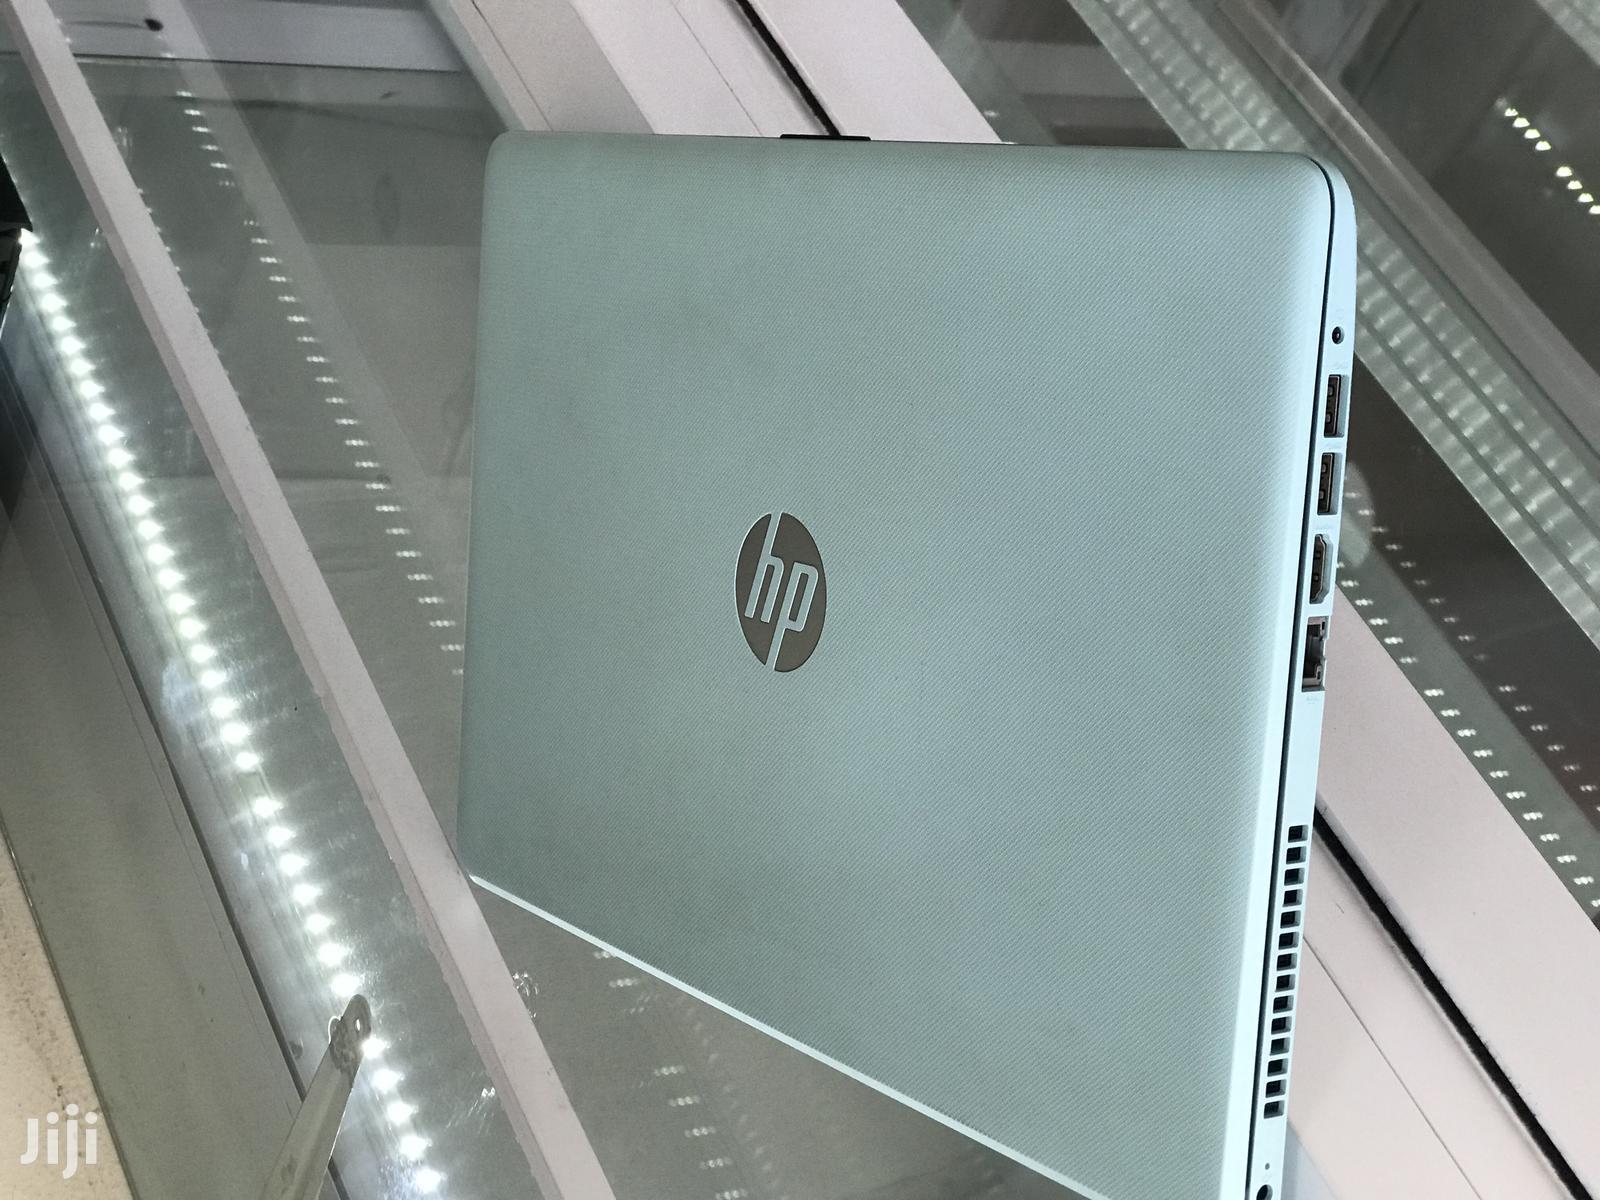 New Laptop HP 15-F272wm 8GB AMD HDD 1T | Laptops & Computers for sale in Kumasi Metropolitan, Ashanti, Ghana